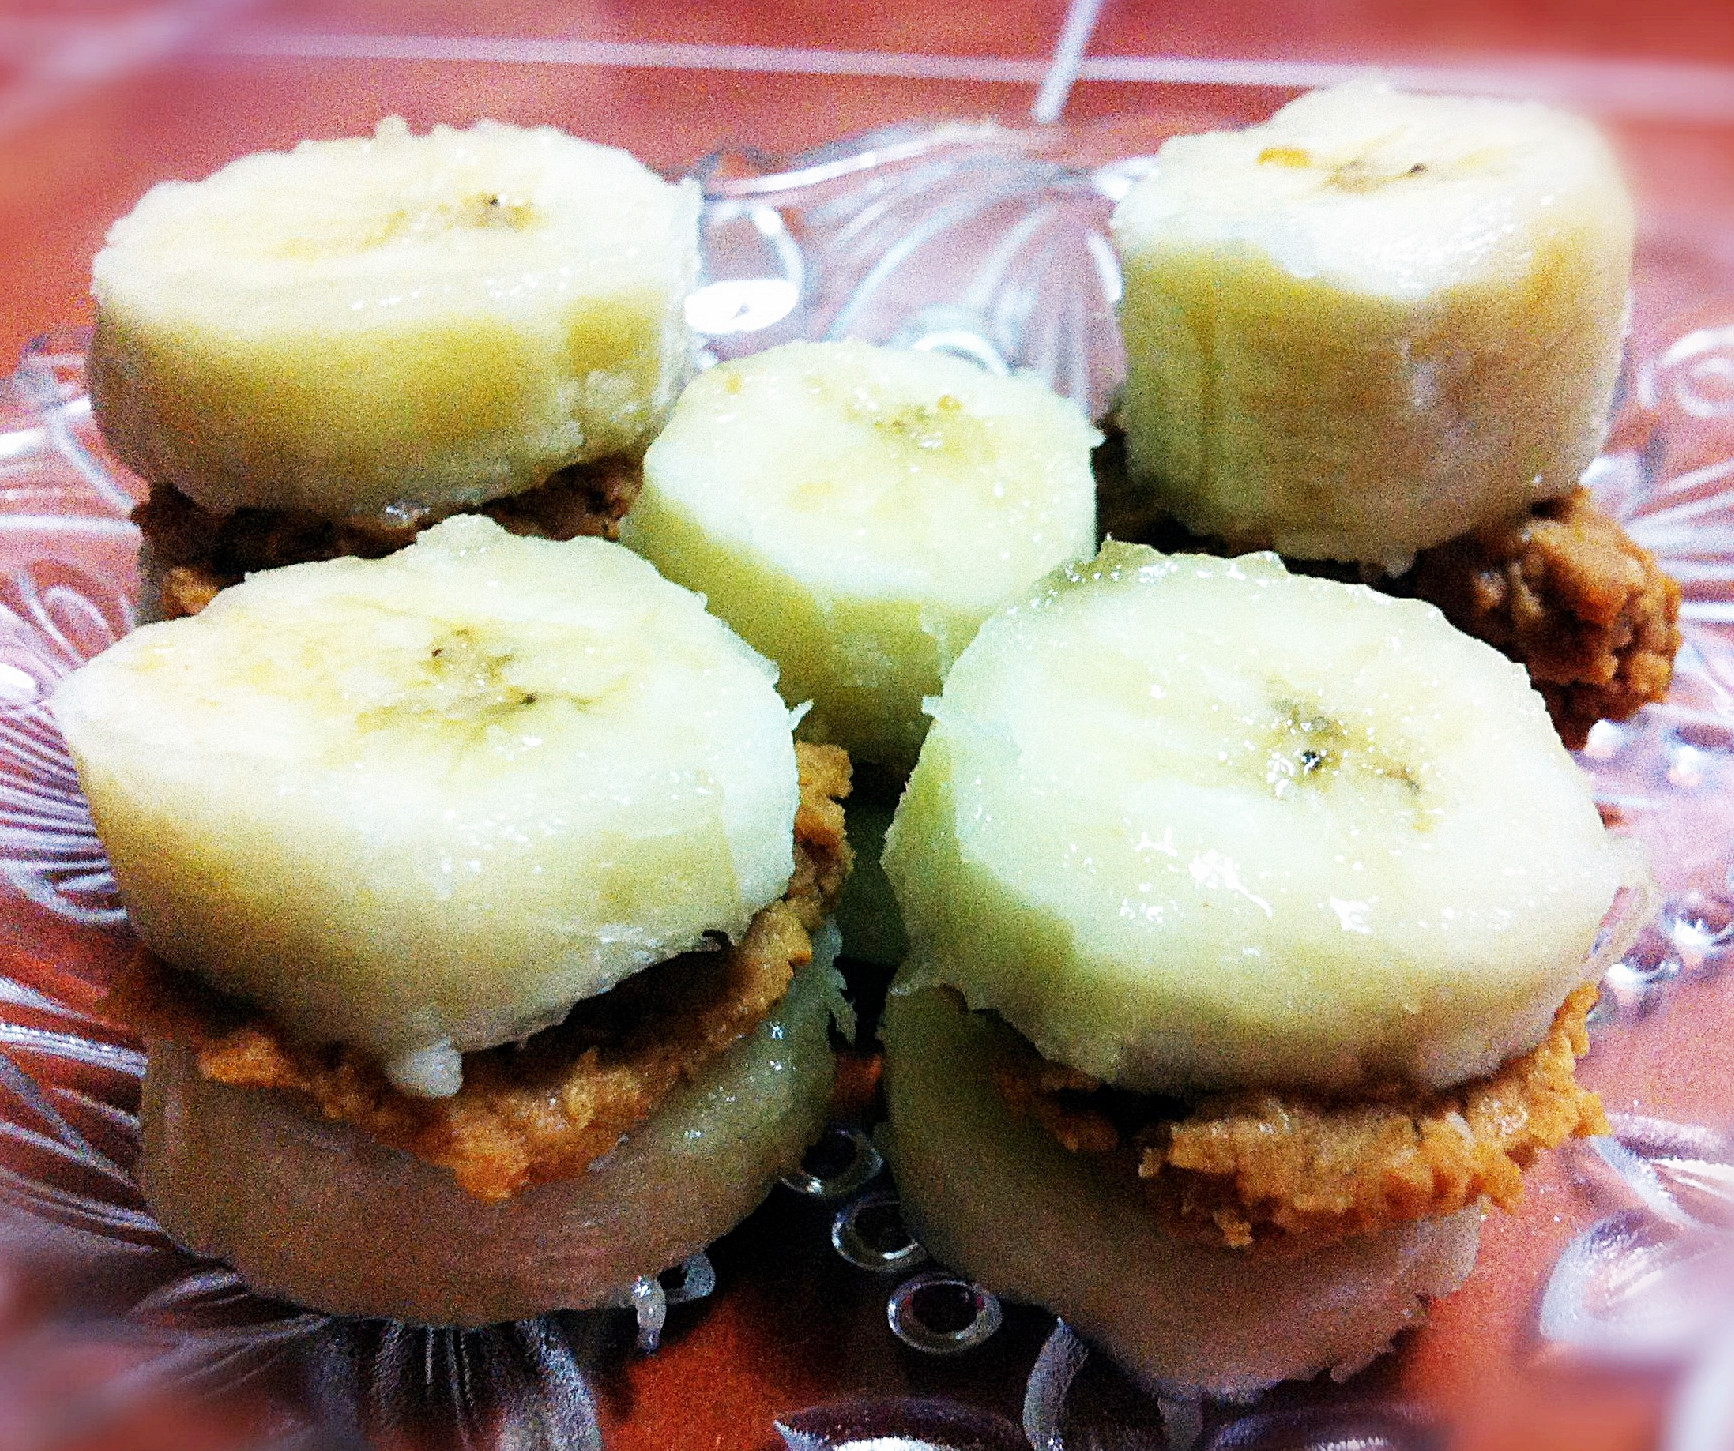 Healthy Banana Dessert  Healthy Dessert Ideas Banana and Peanut Butter Bites